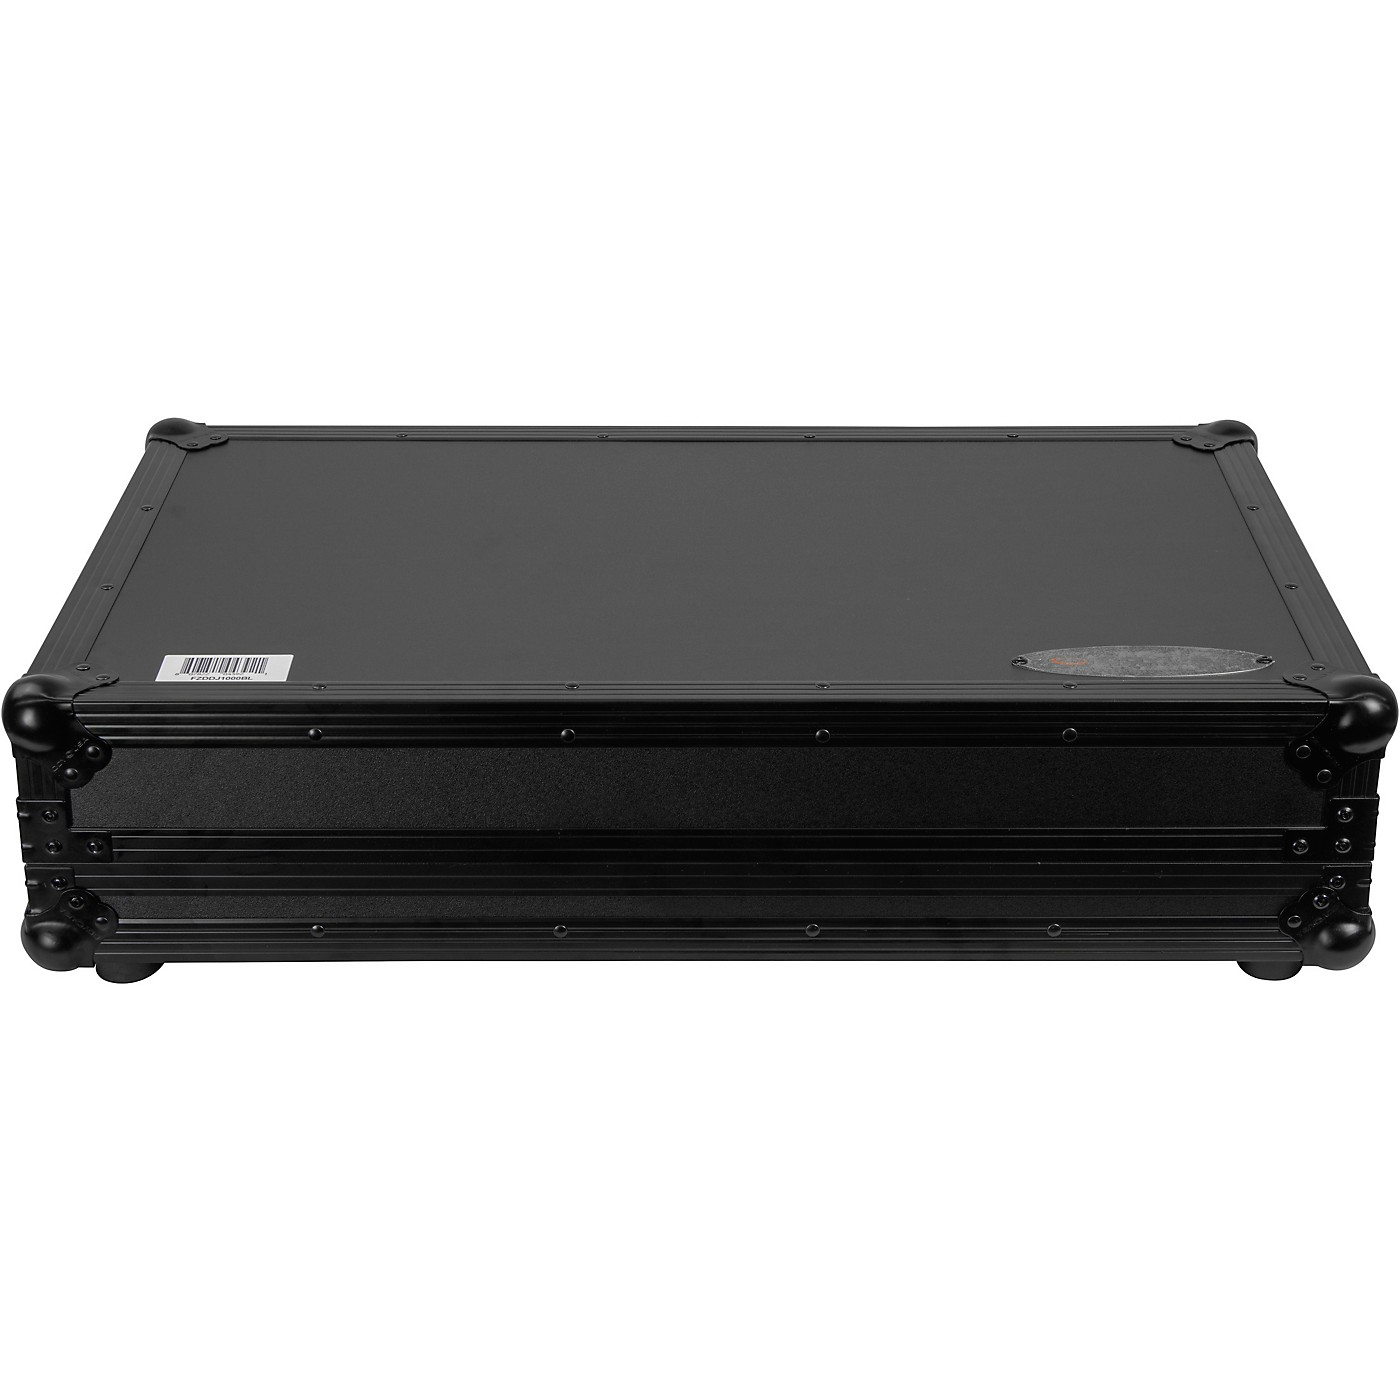 Odyssey FZDDJ1000BL Black Label Low Profile Series Pioneer DDJ-1000 DJ Controller Case thumbnail